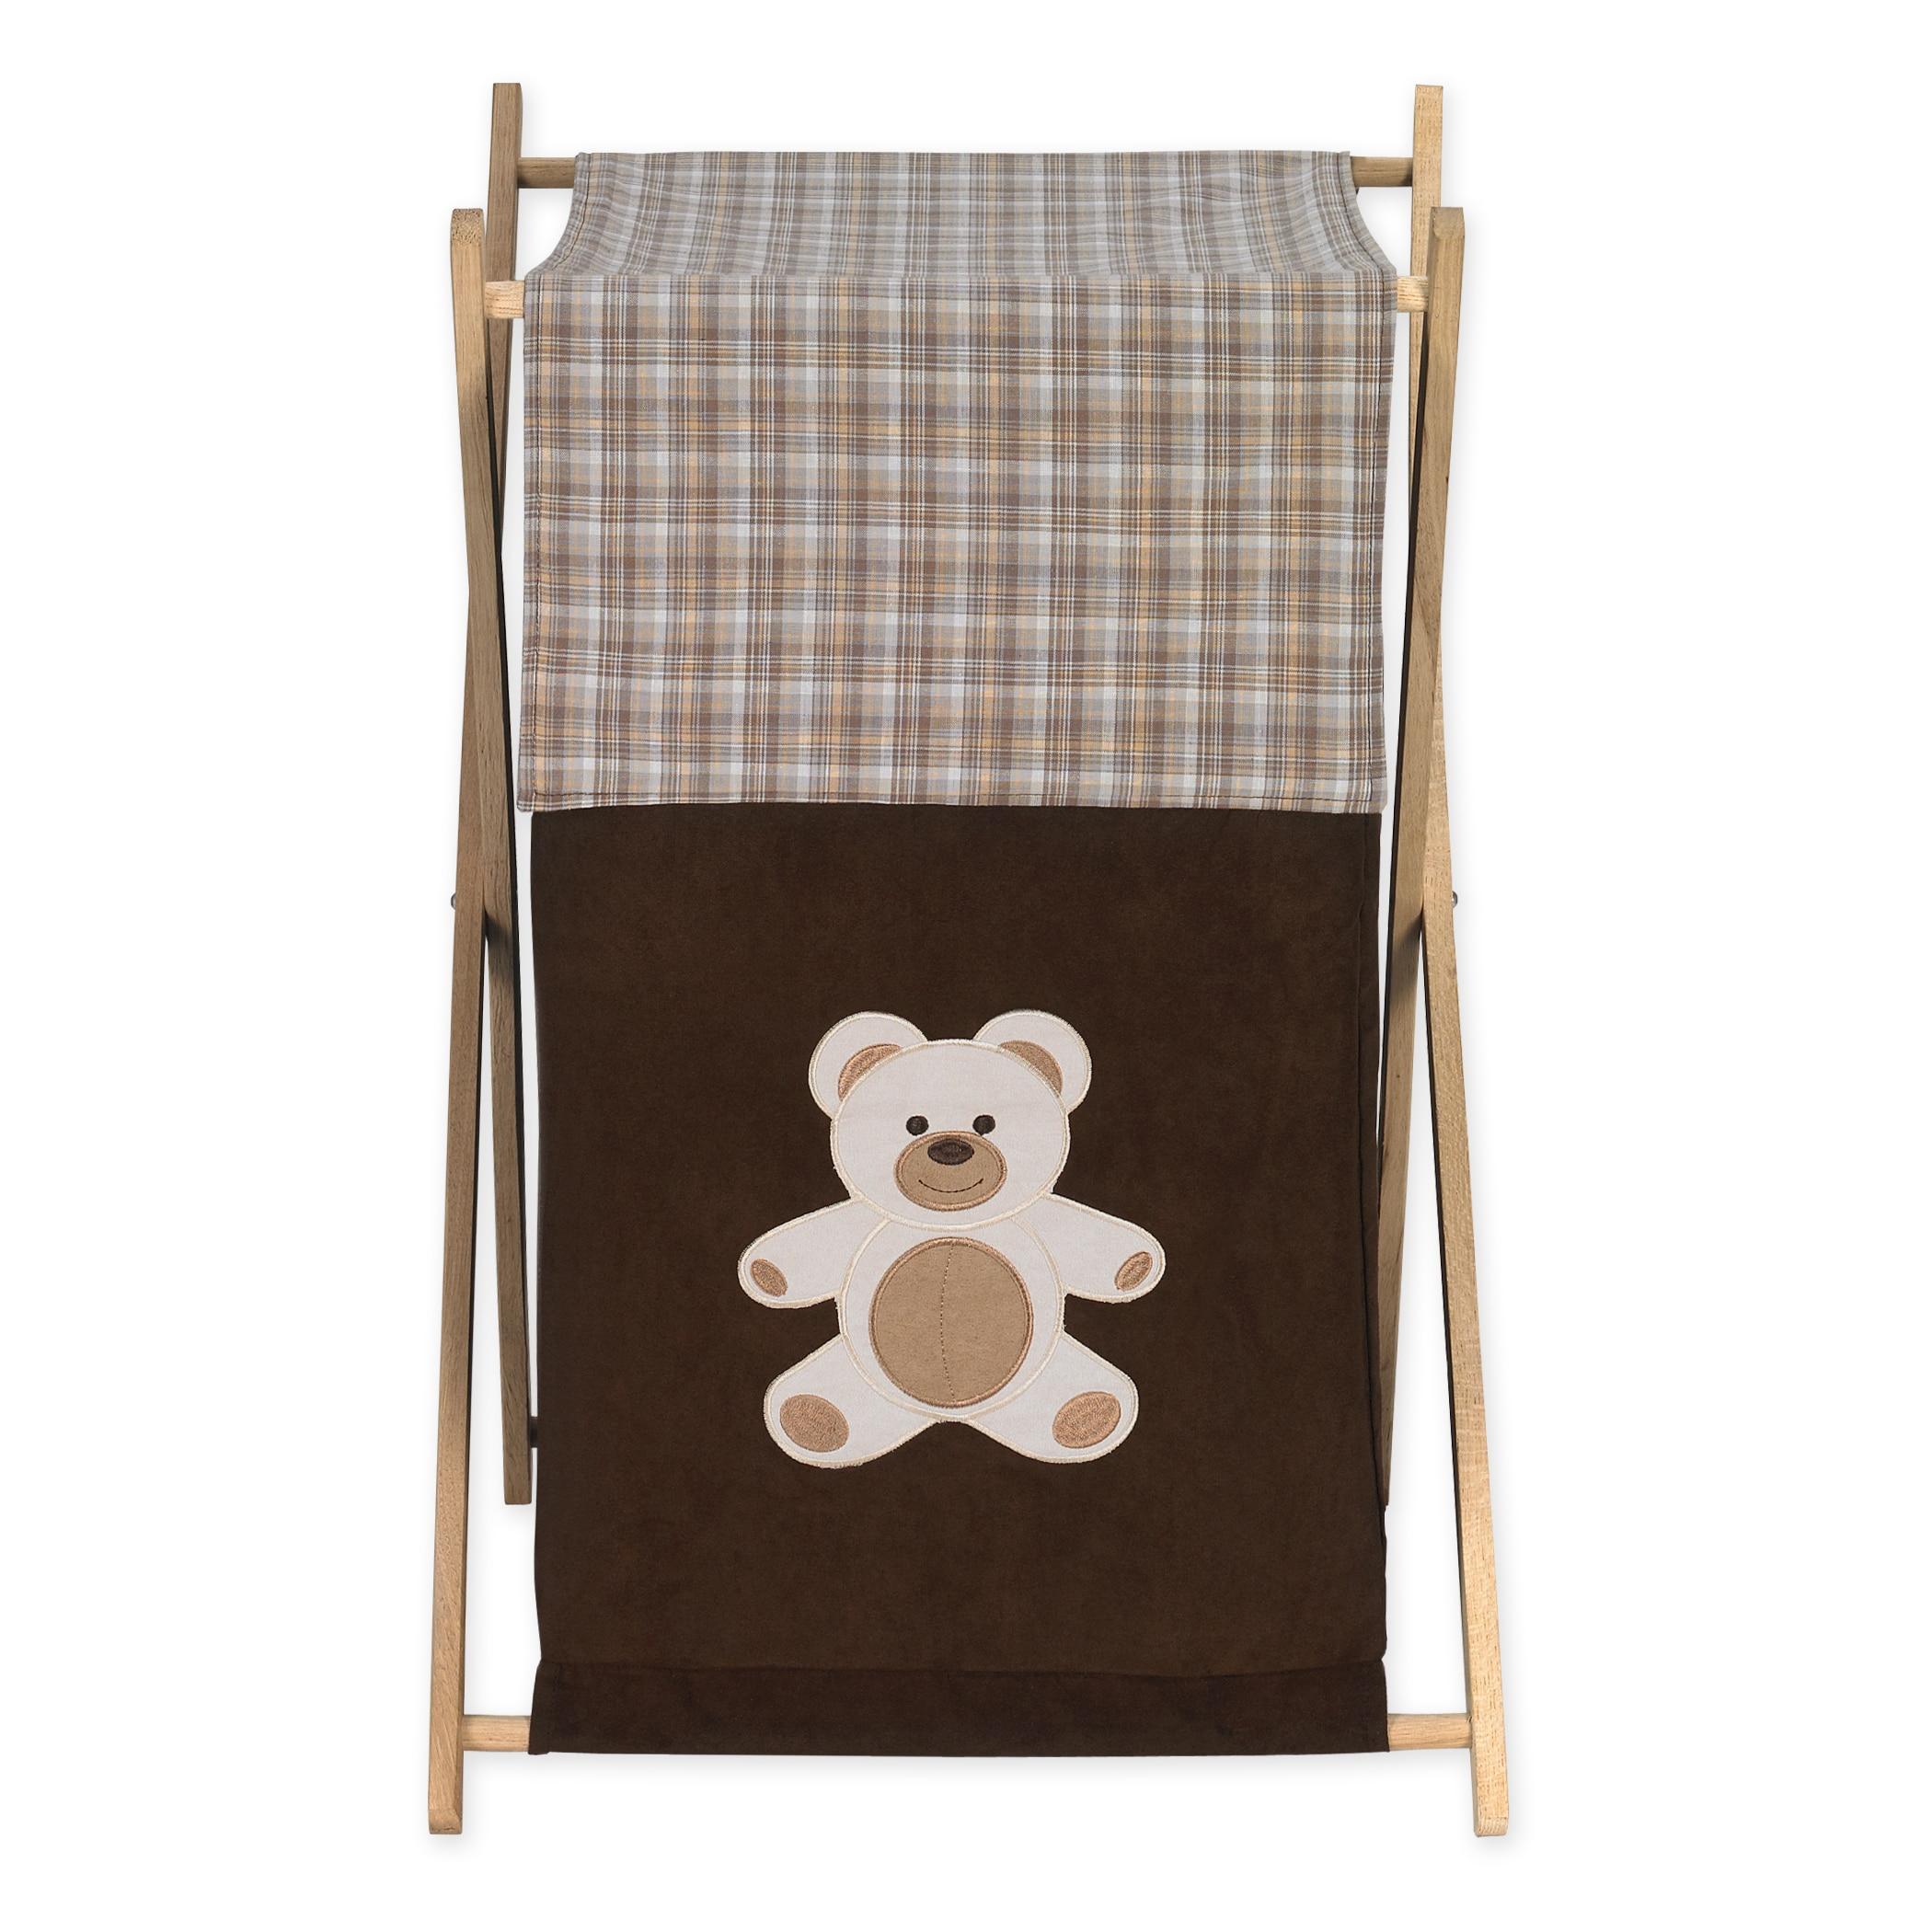 JoJo Designs Chocolate Teddy Bear Collection Brown Fabric...